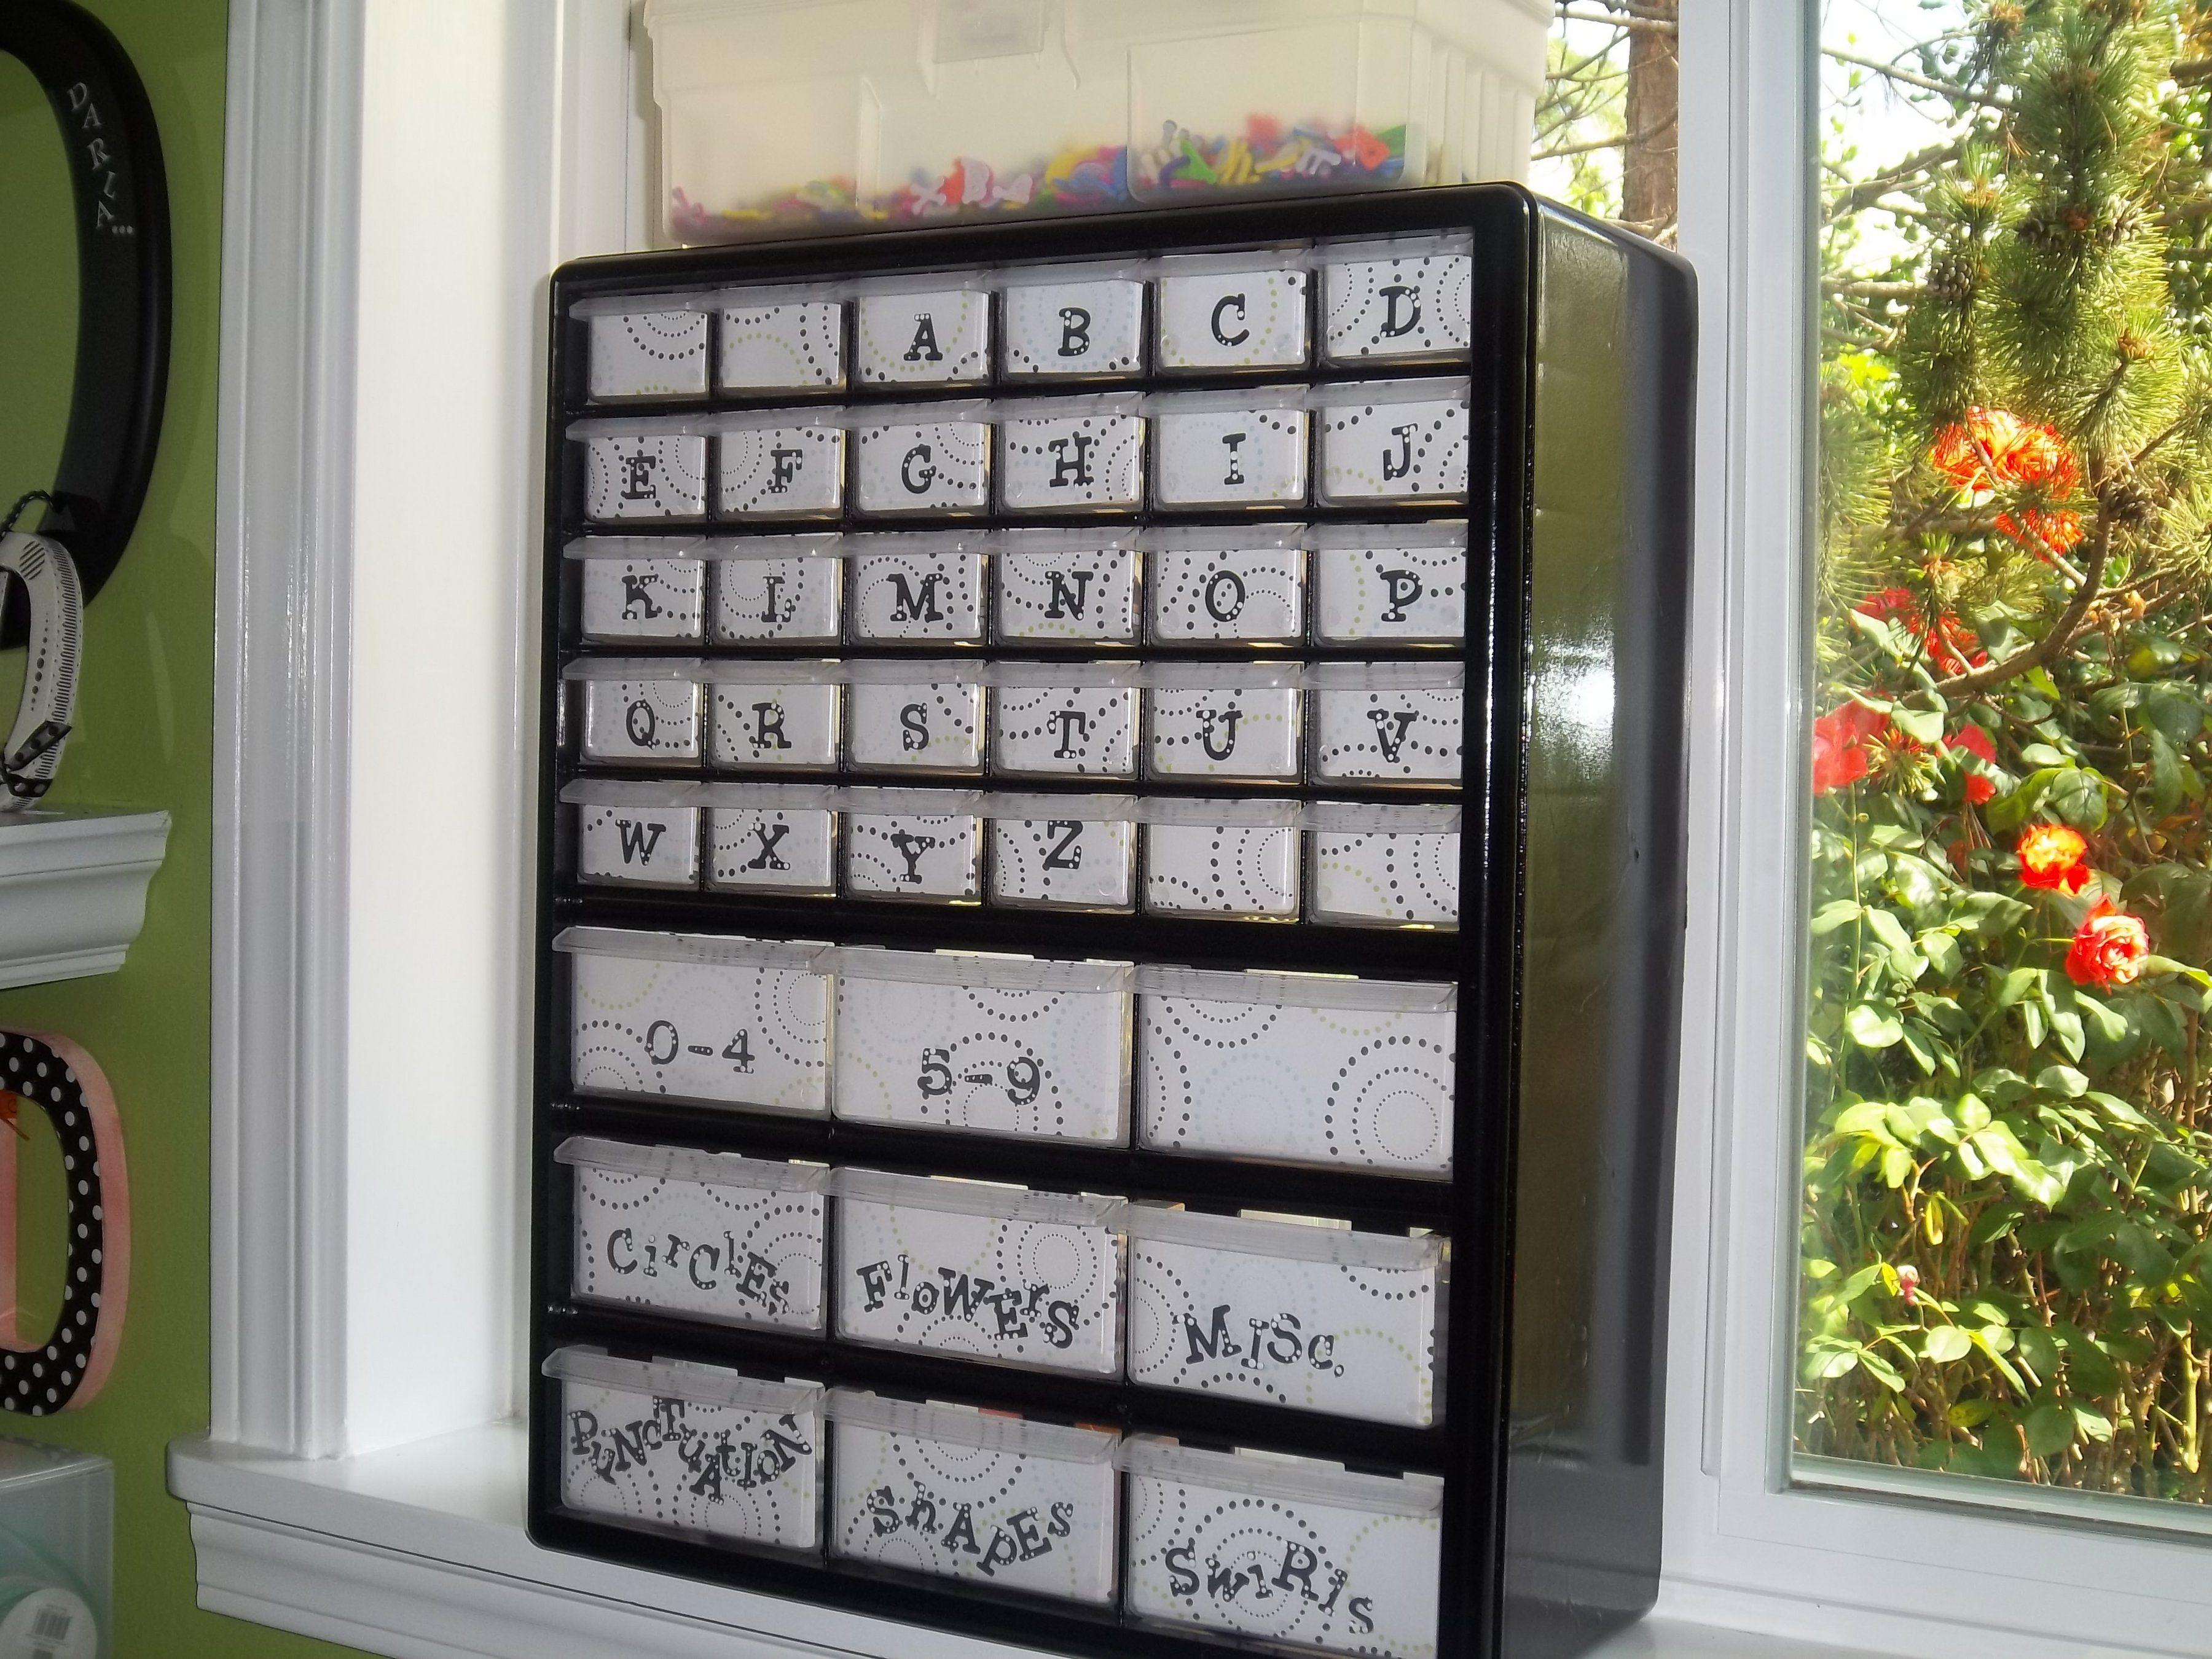 Scrapbook room storage ideas - Chipboard Letter Storage Scrapbook Com Love This Idea For My Scrapbooking